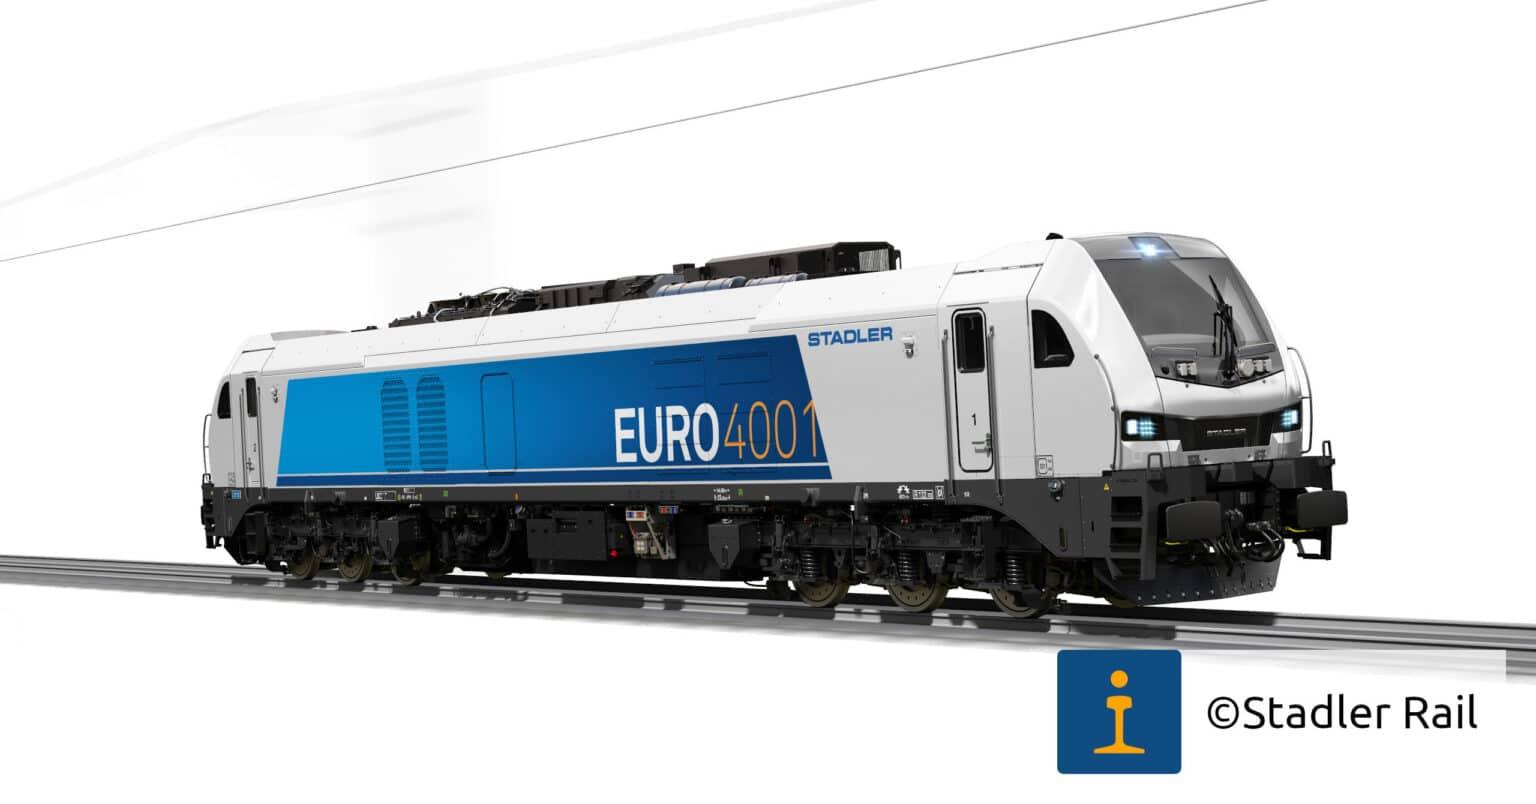 Diseño a ordenador de la familia Euro4001 de Stadler Rail Valencia